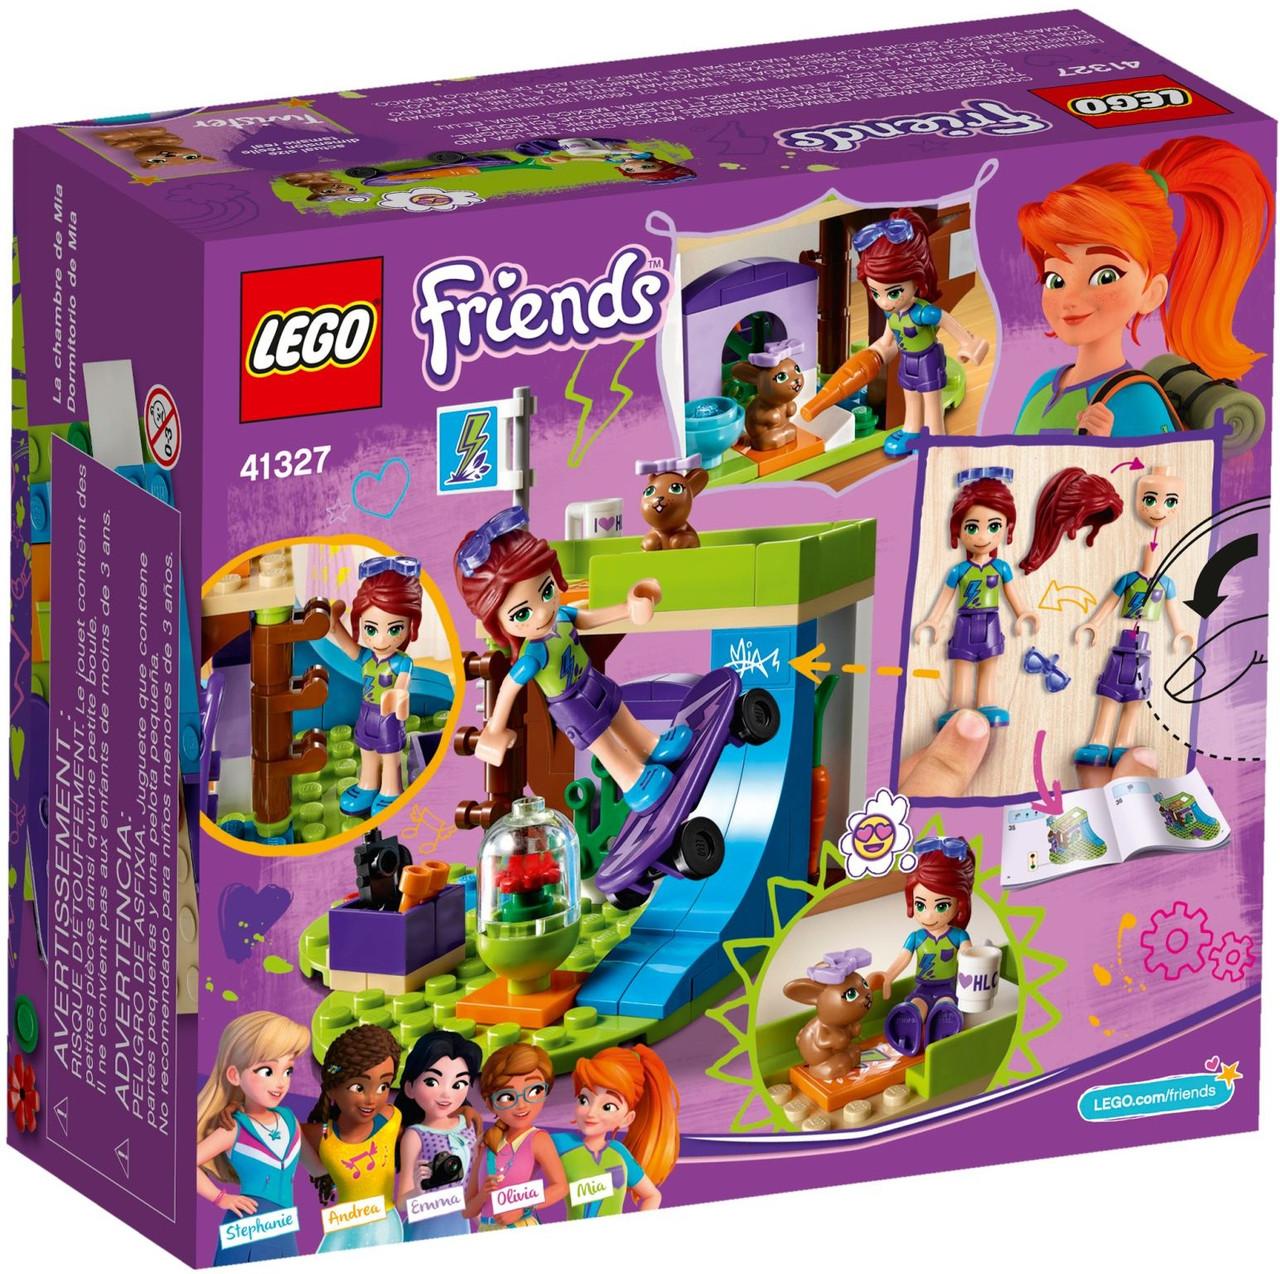 41327 Lego Friends Mia S Bedroom Brick Lady